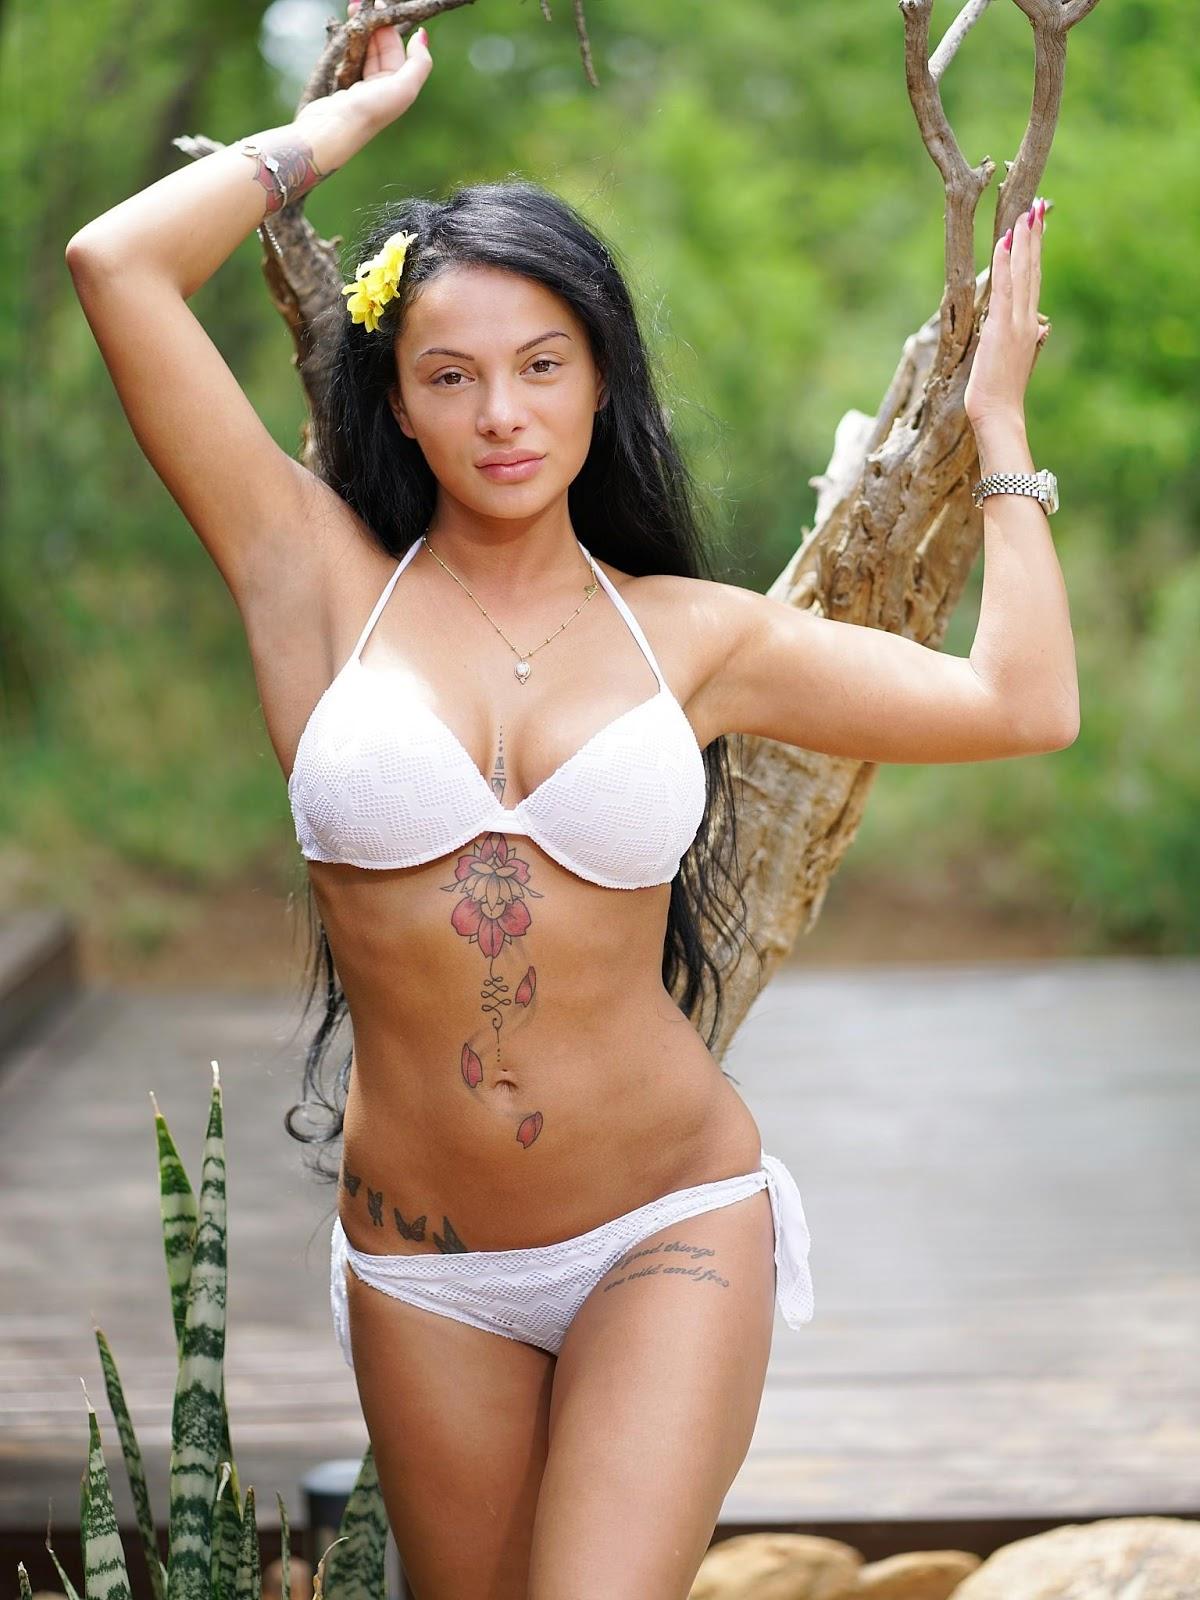 Tiffany van soest nude